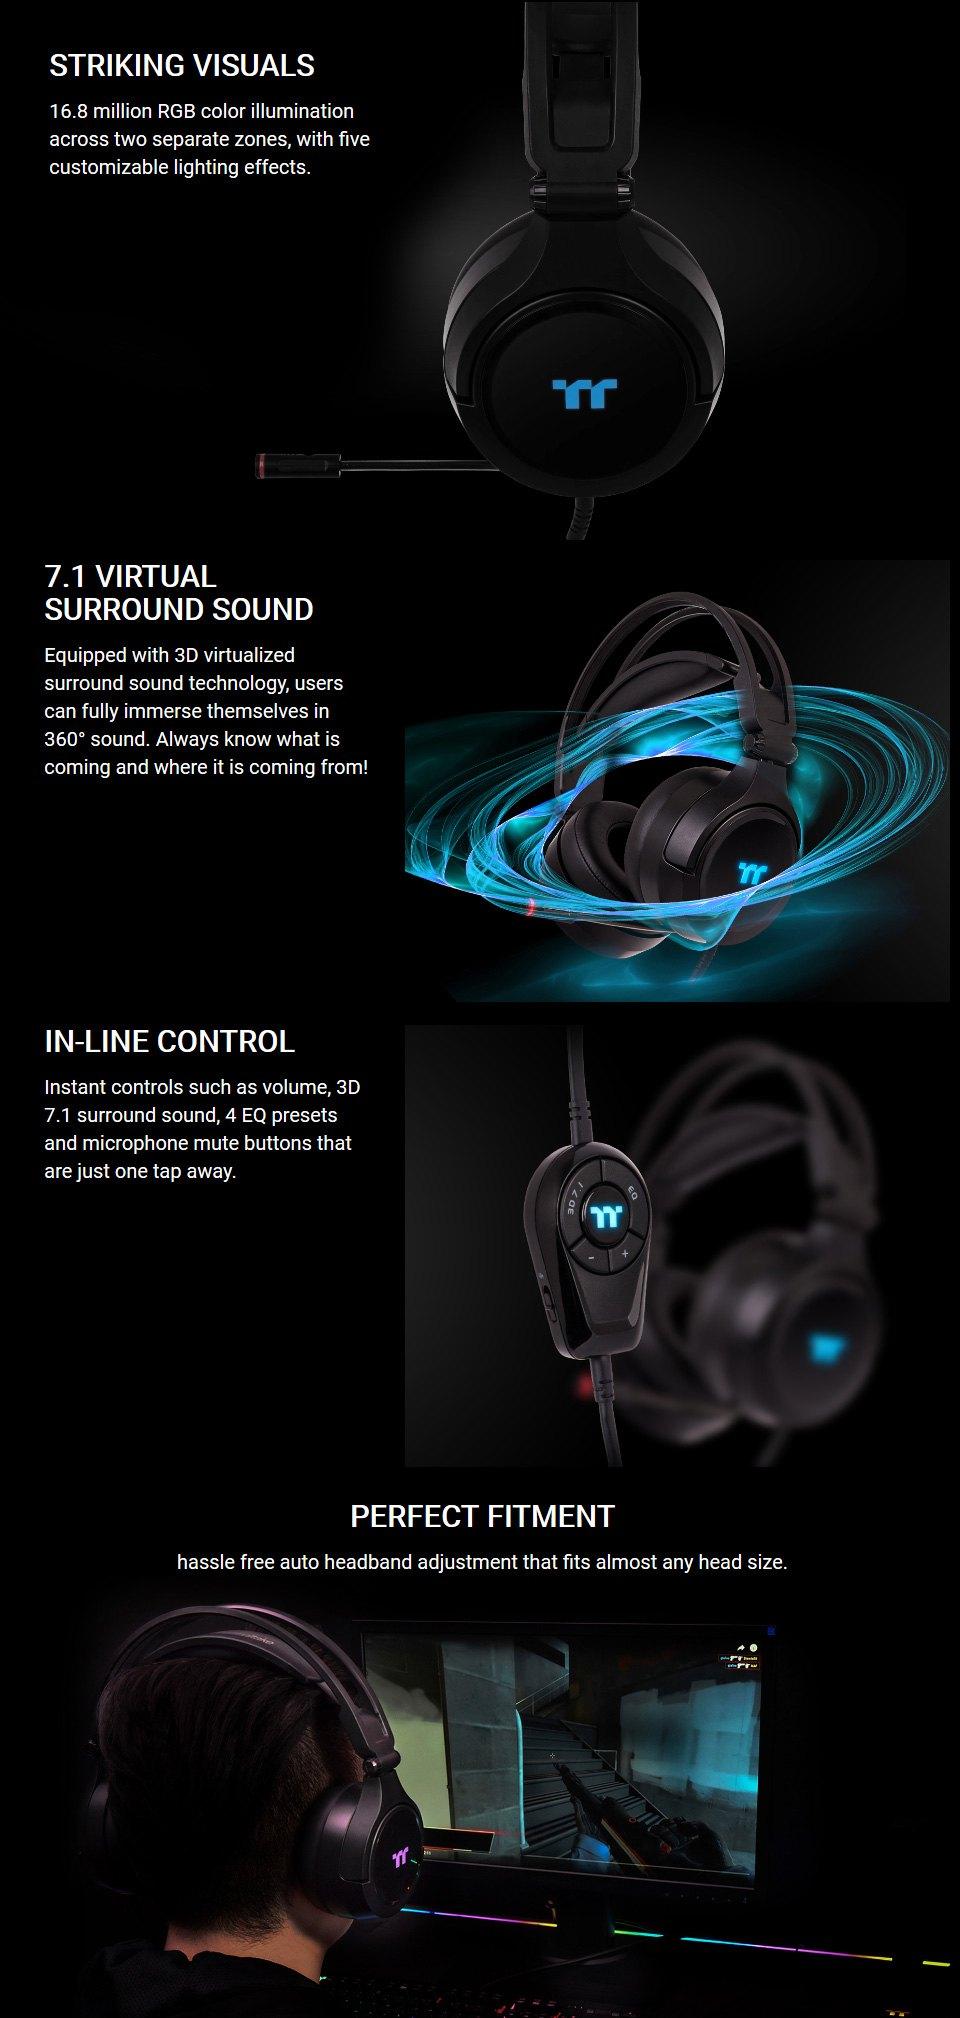 Thermaltake RIING Pro RGB 7.1 Surround Gaming Headset features 2